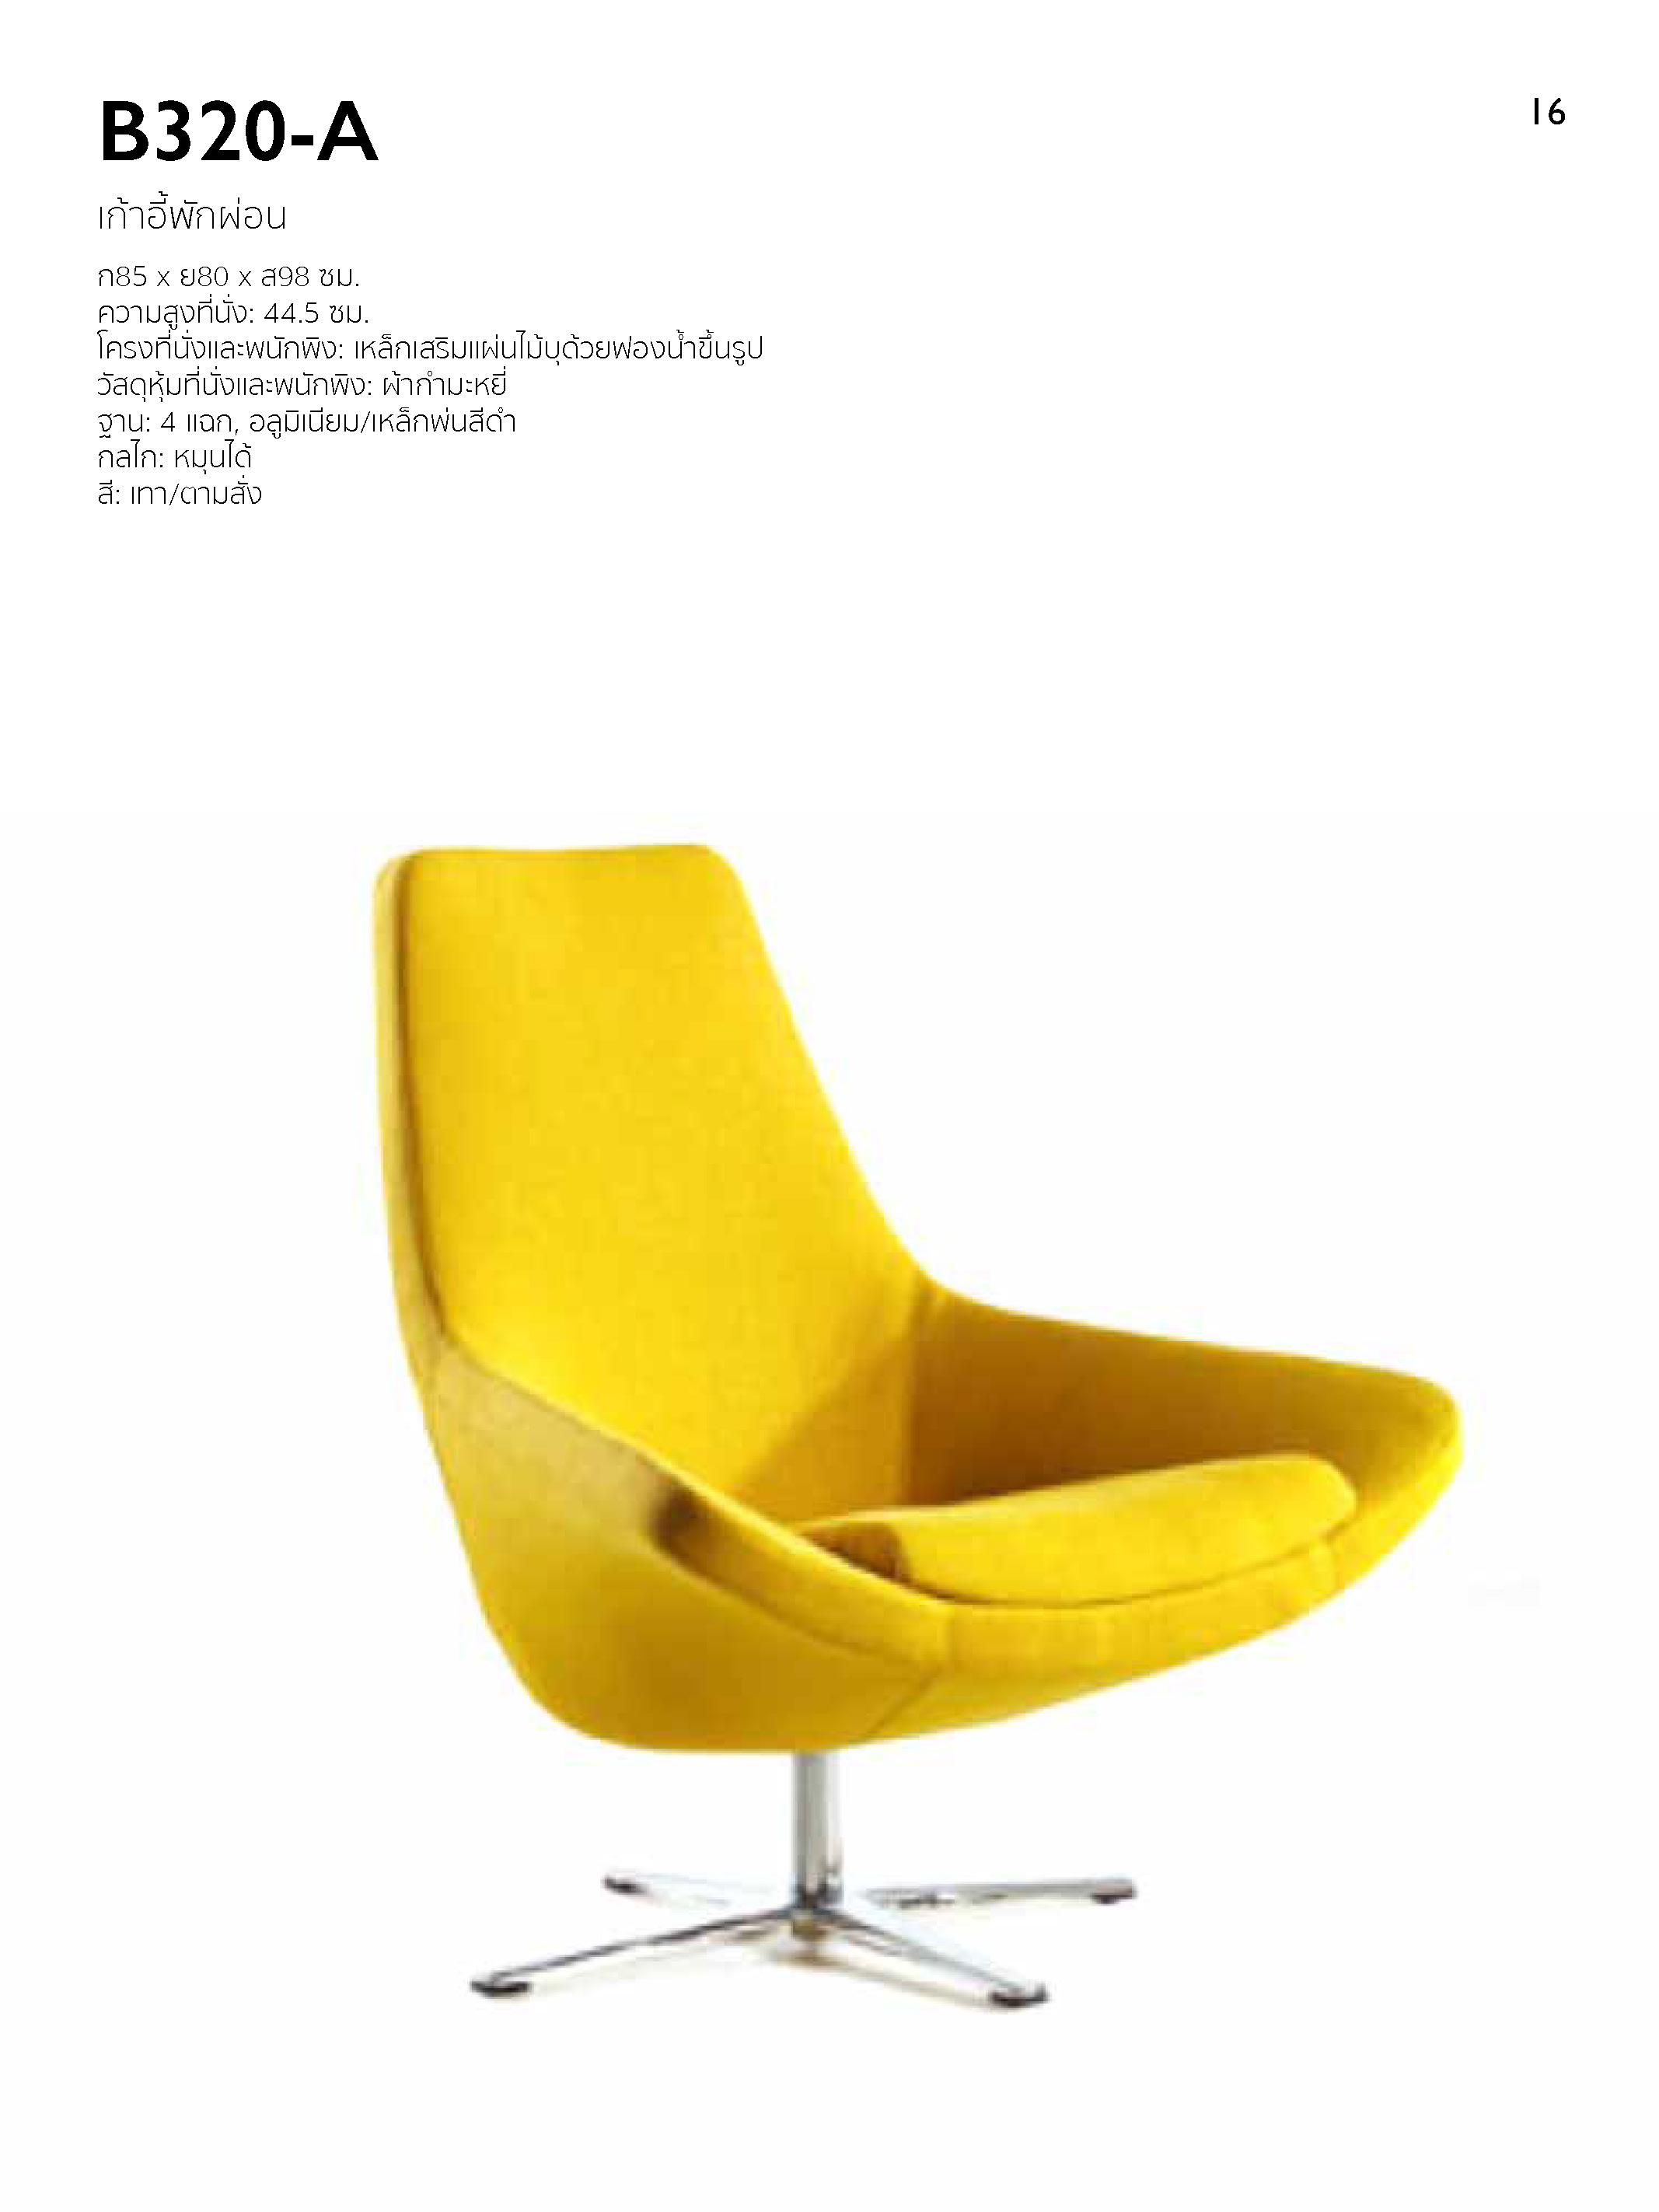 Top Furniture Catalog 2019_Page_51.jpg